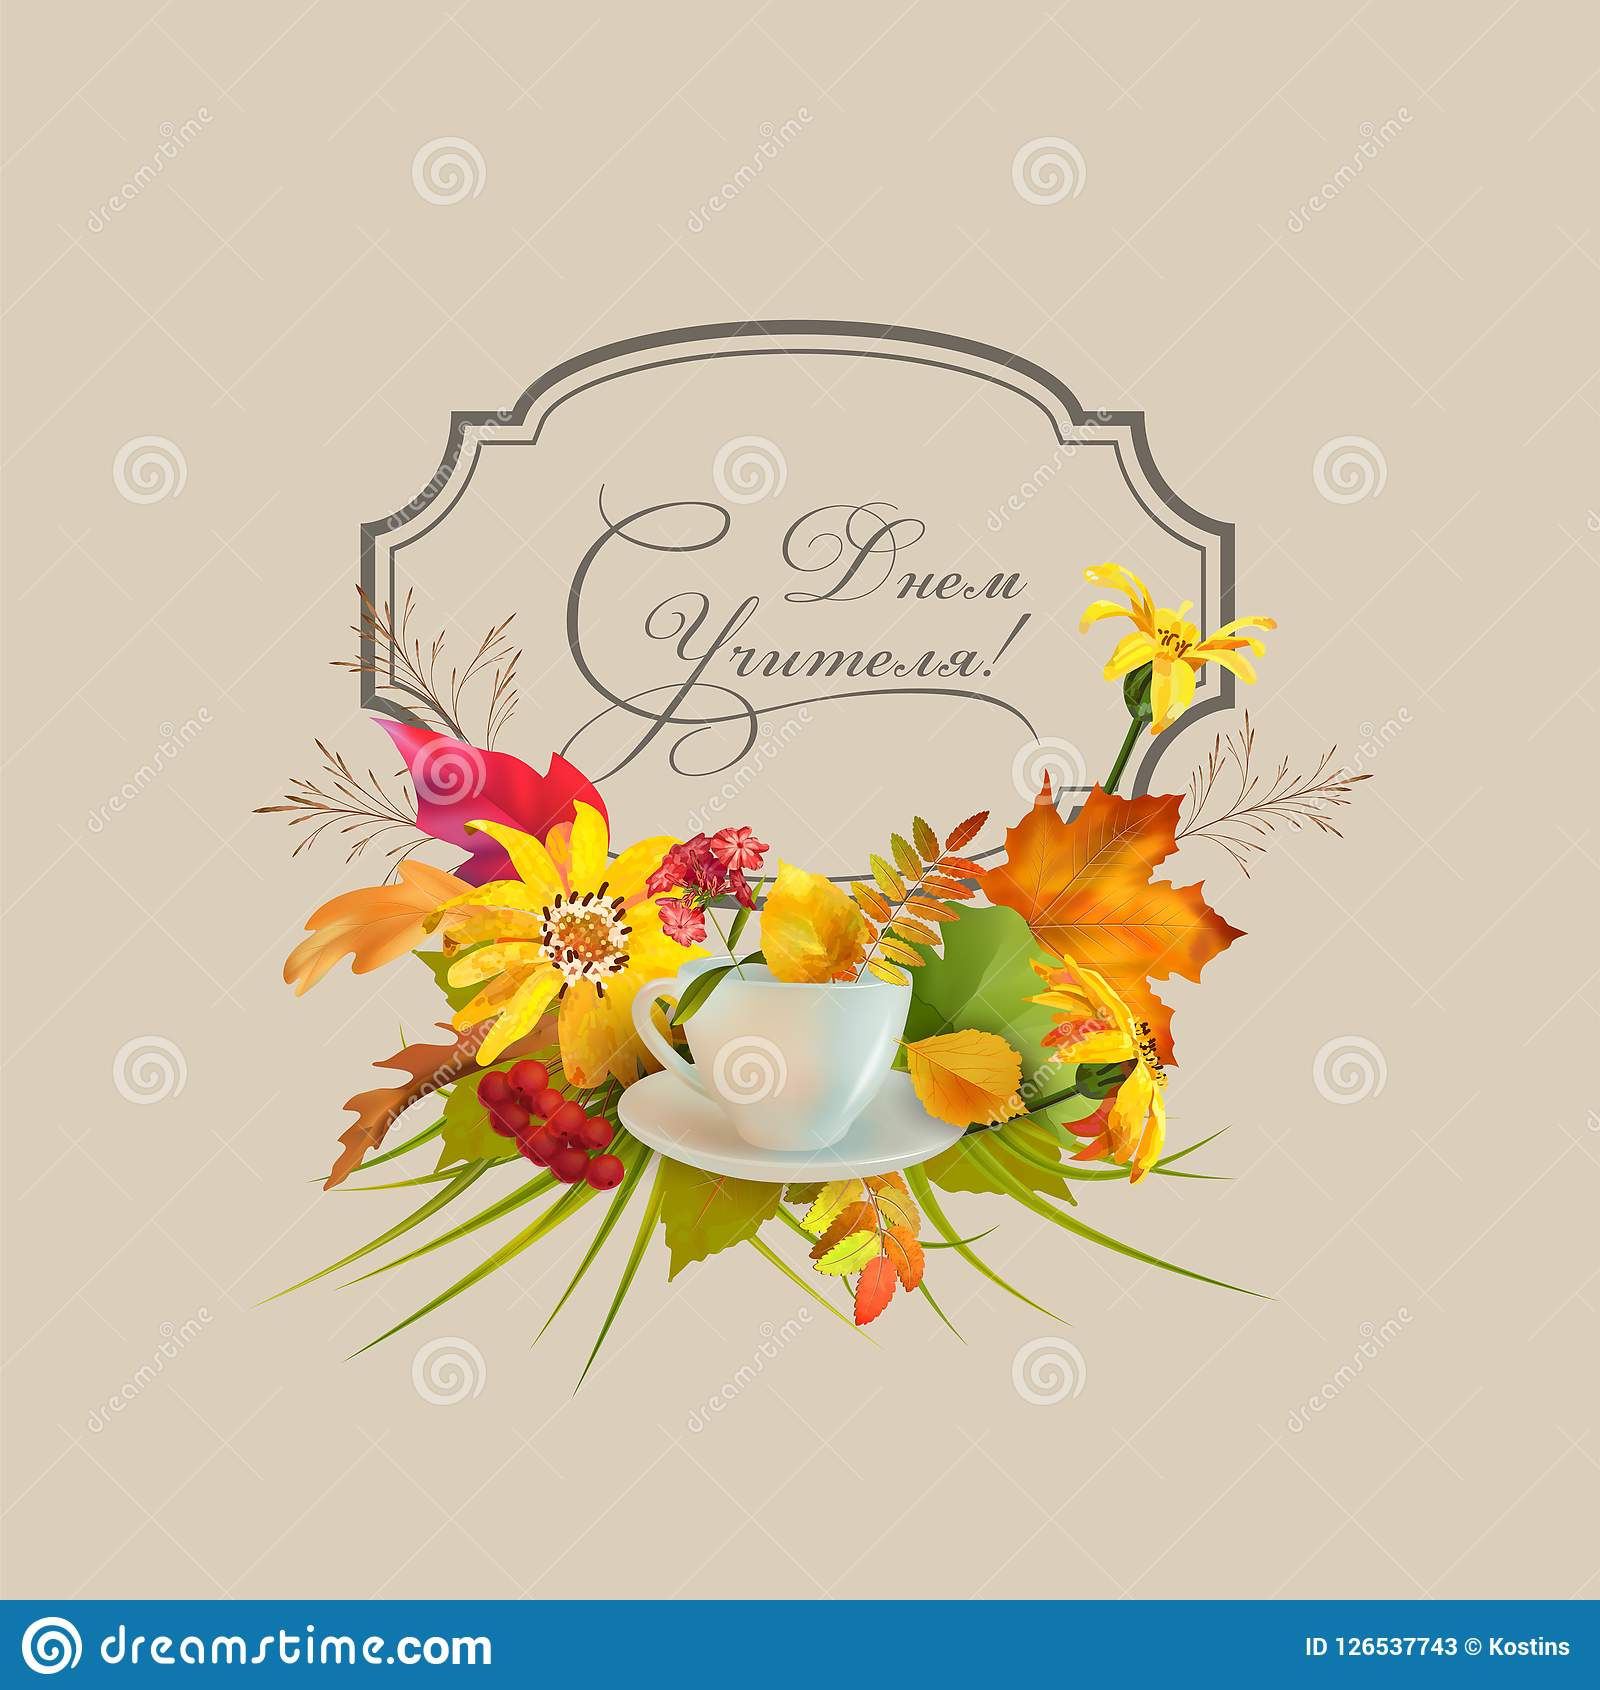 Teachers Day Greeting Card Stock Vector Illustration Of November